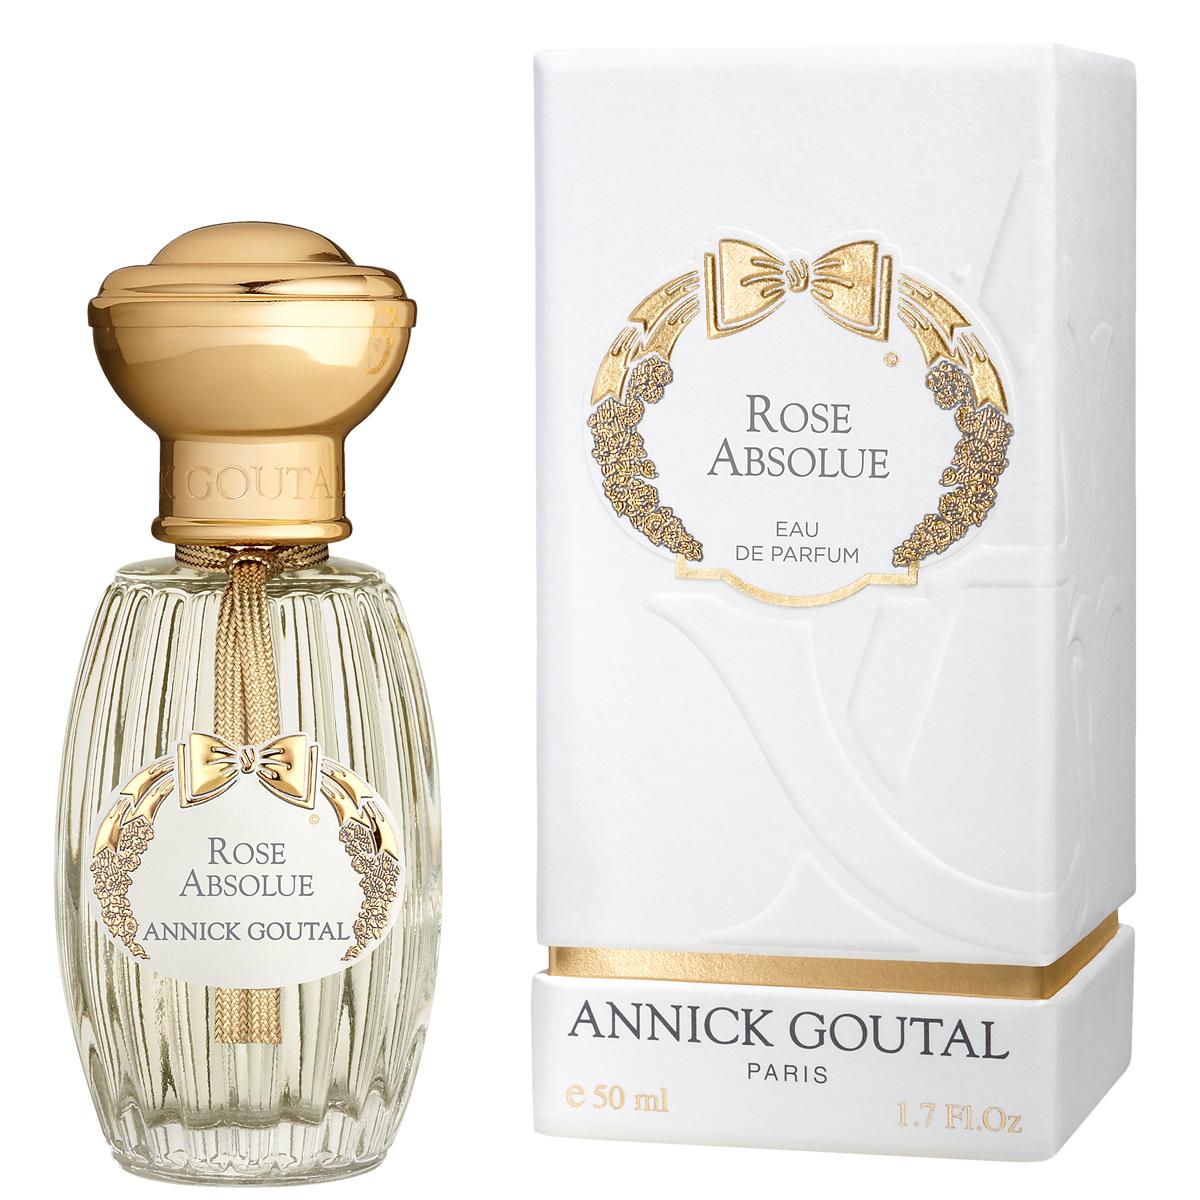 ROSE ABSOLUE – Bild 1